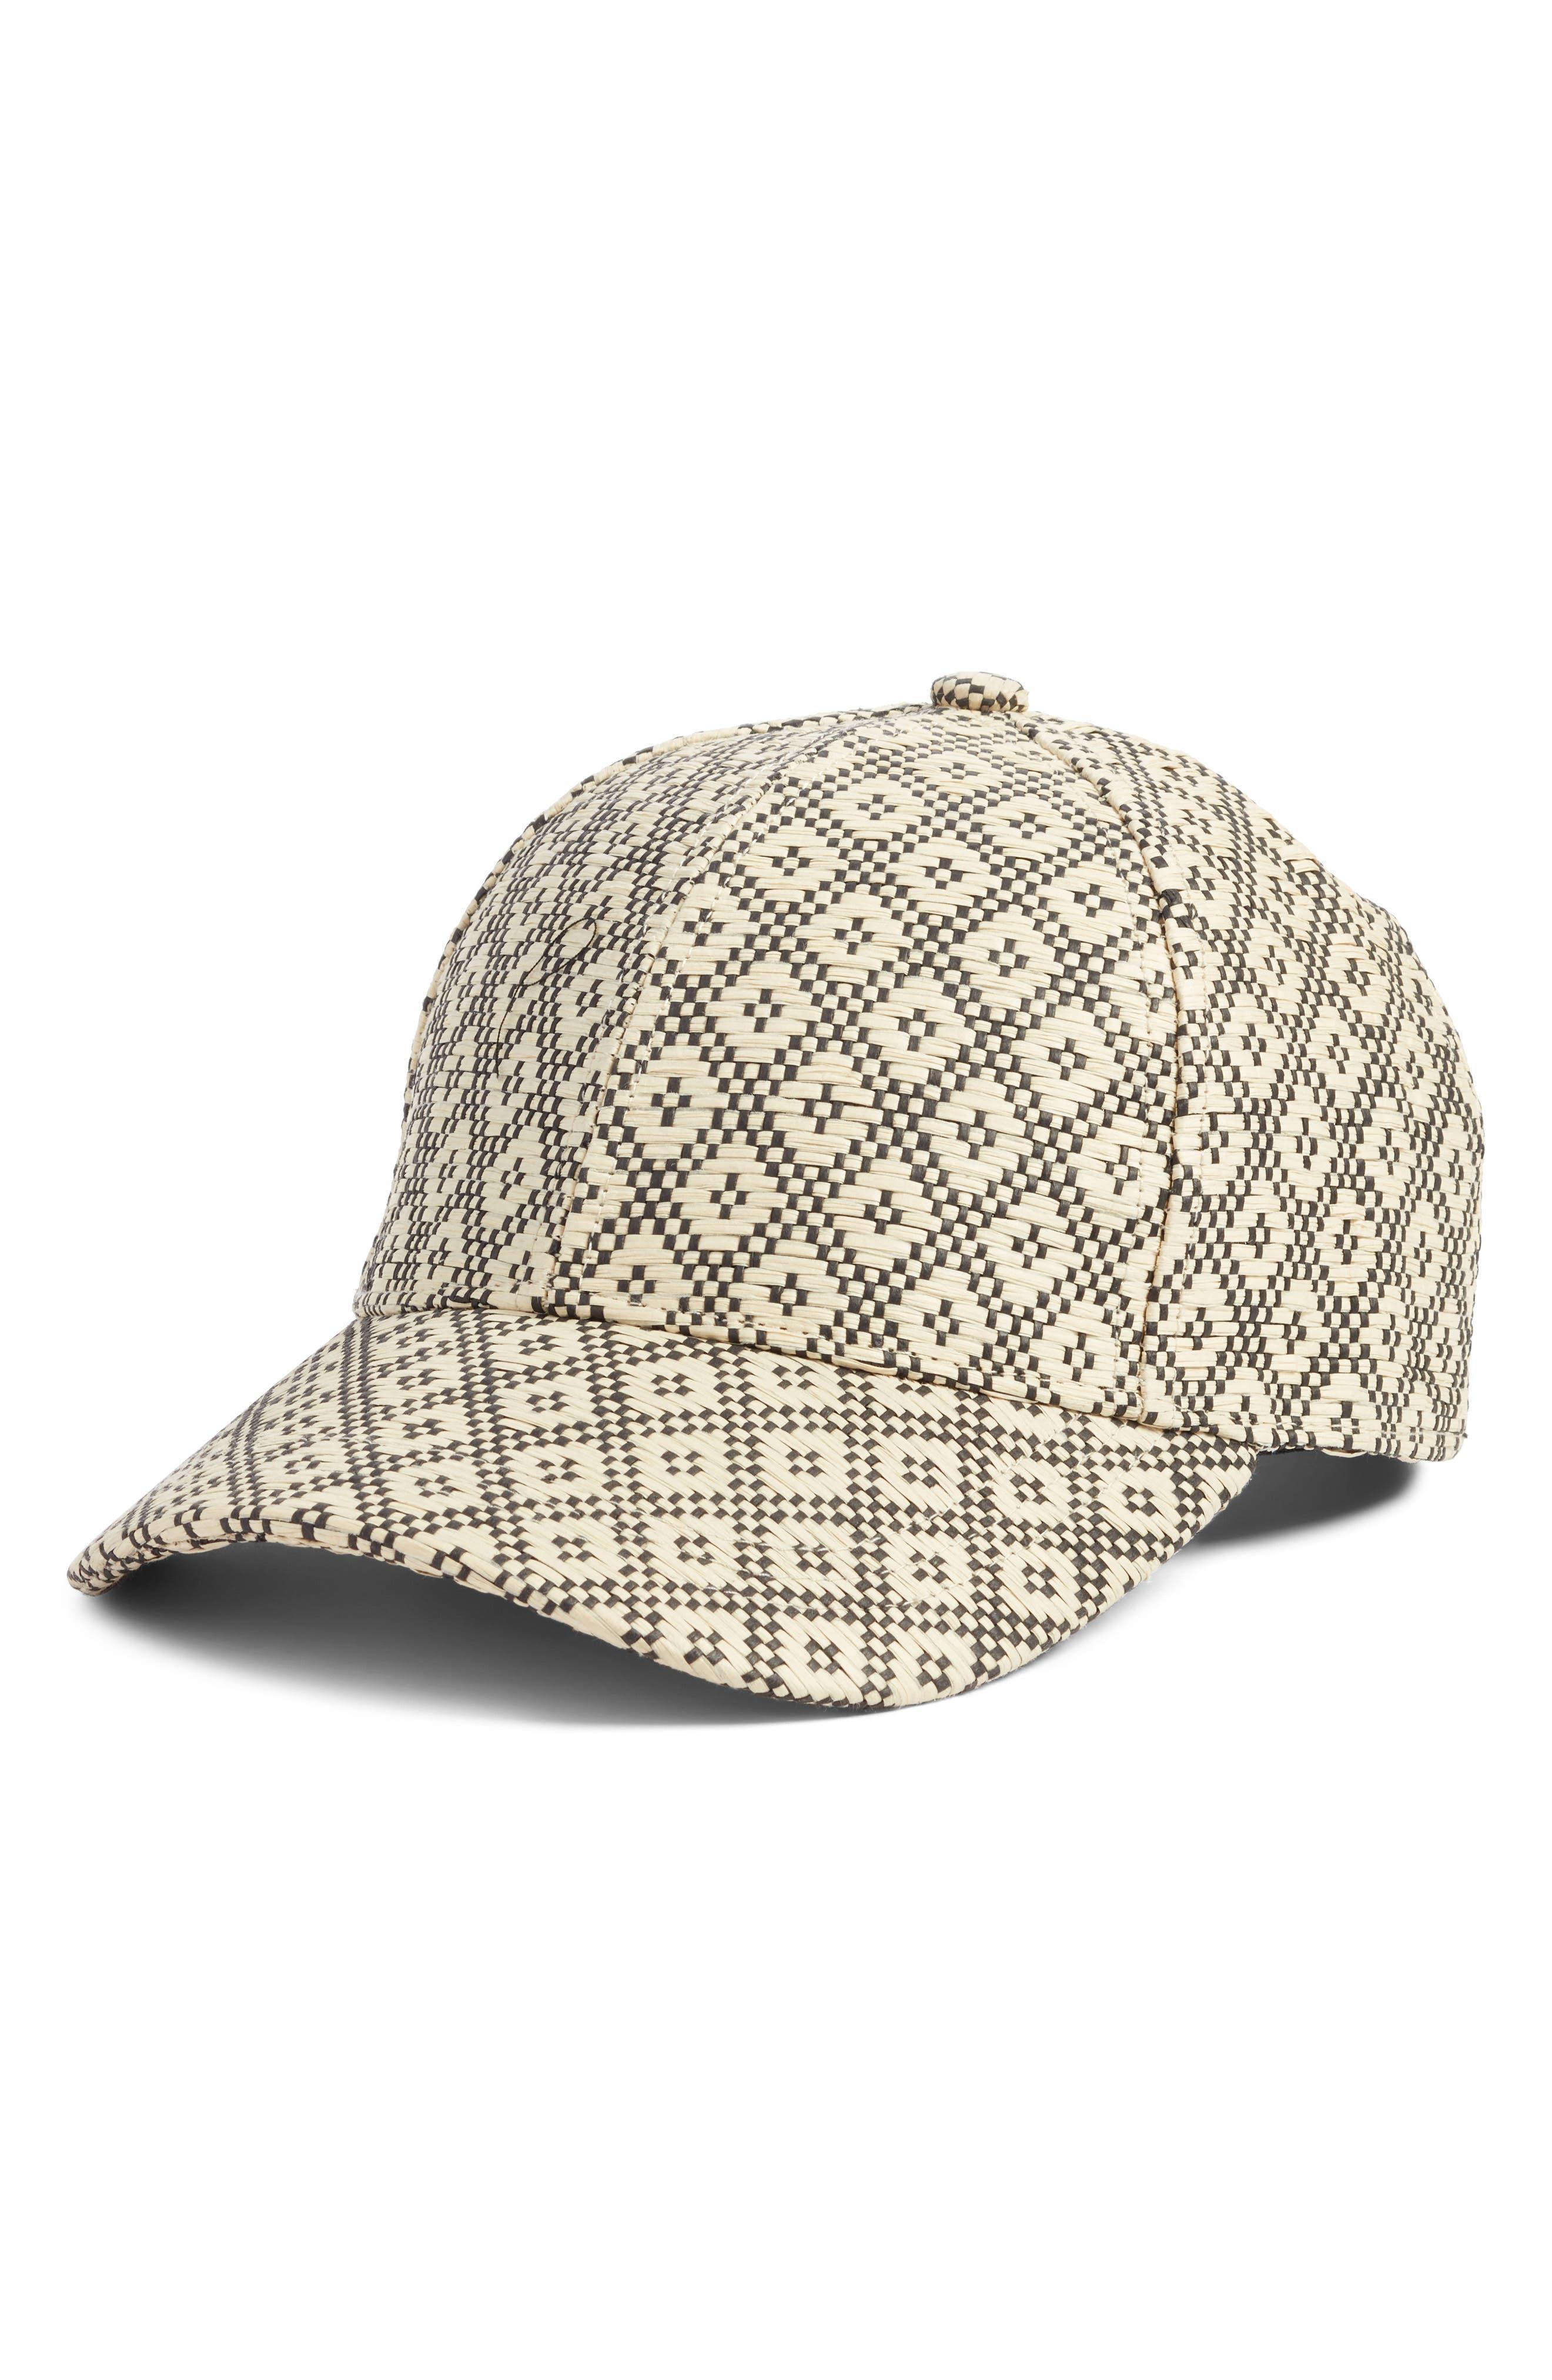 Geo Straw Baseball Cap,                             Main thumbnail 1, color,                             250